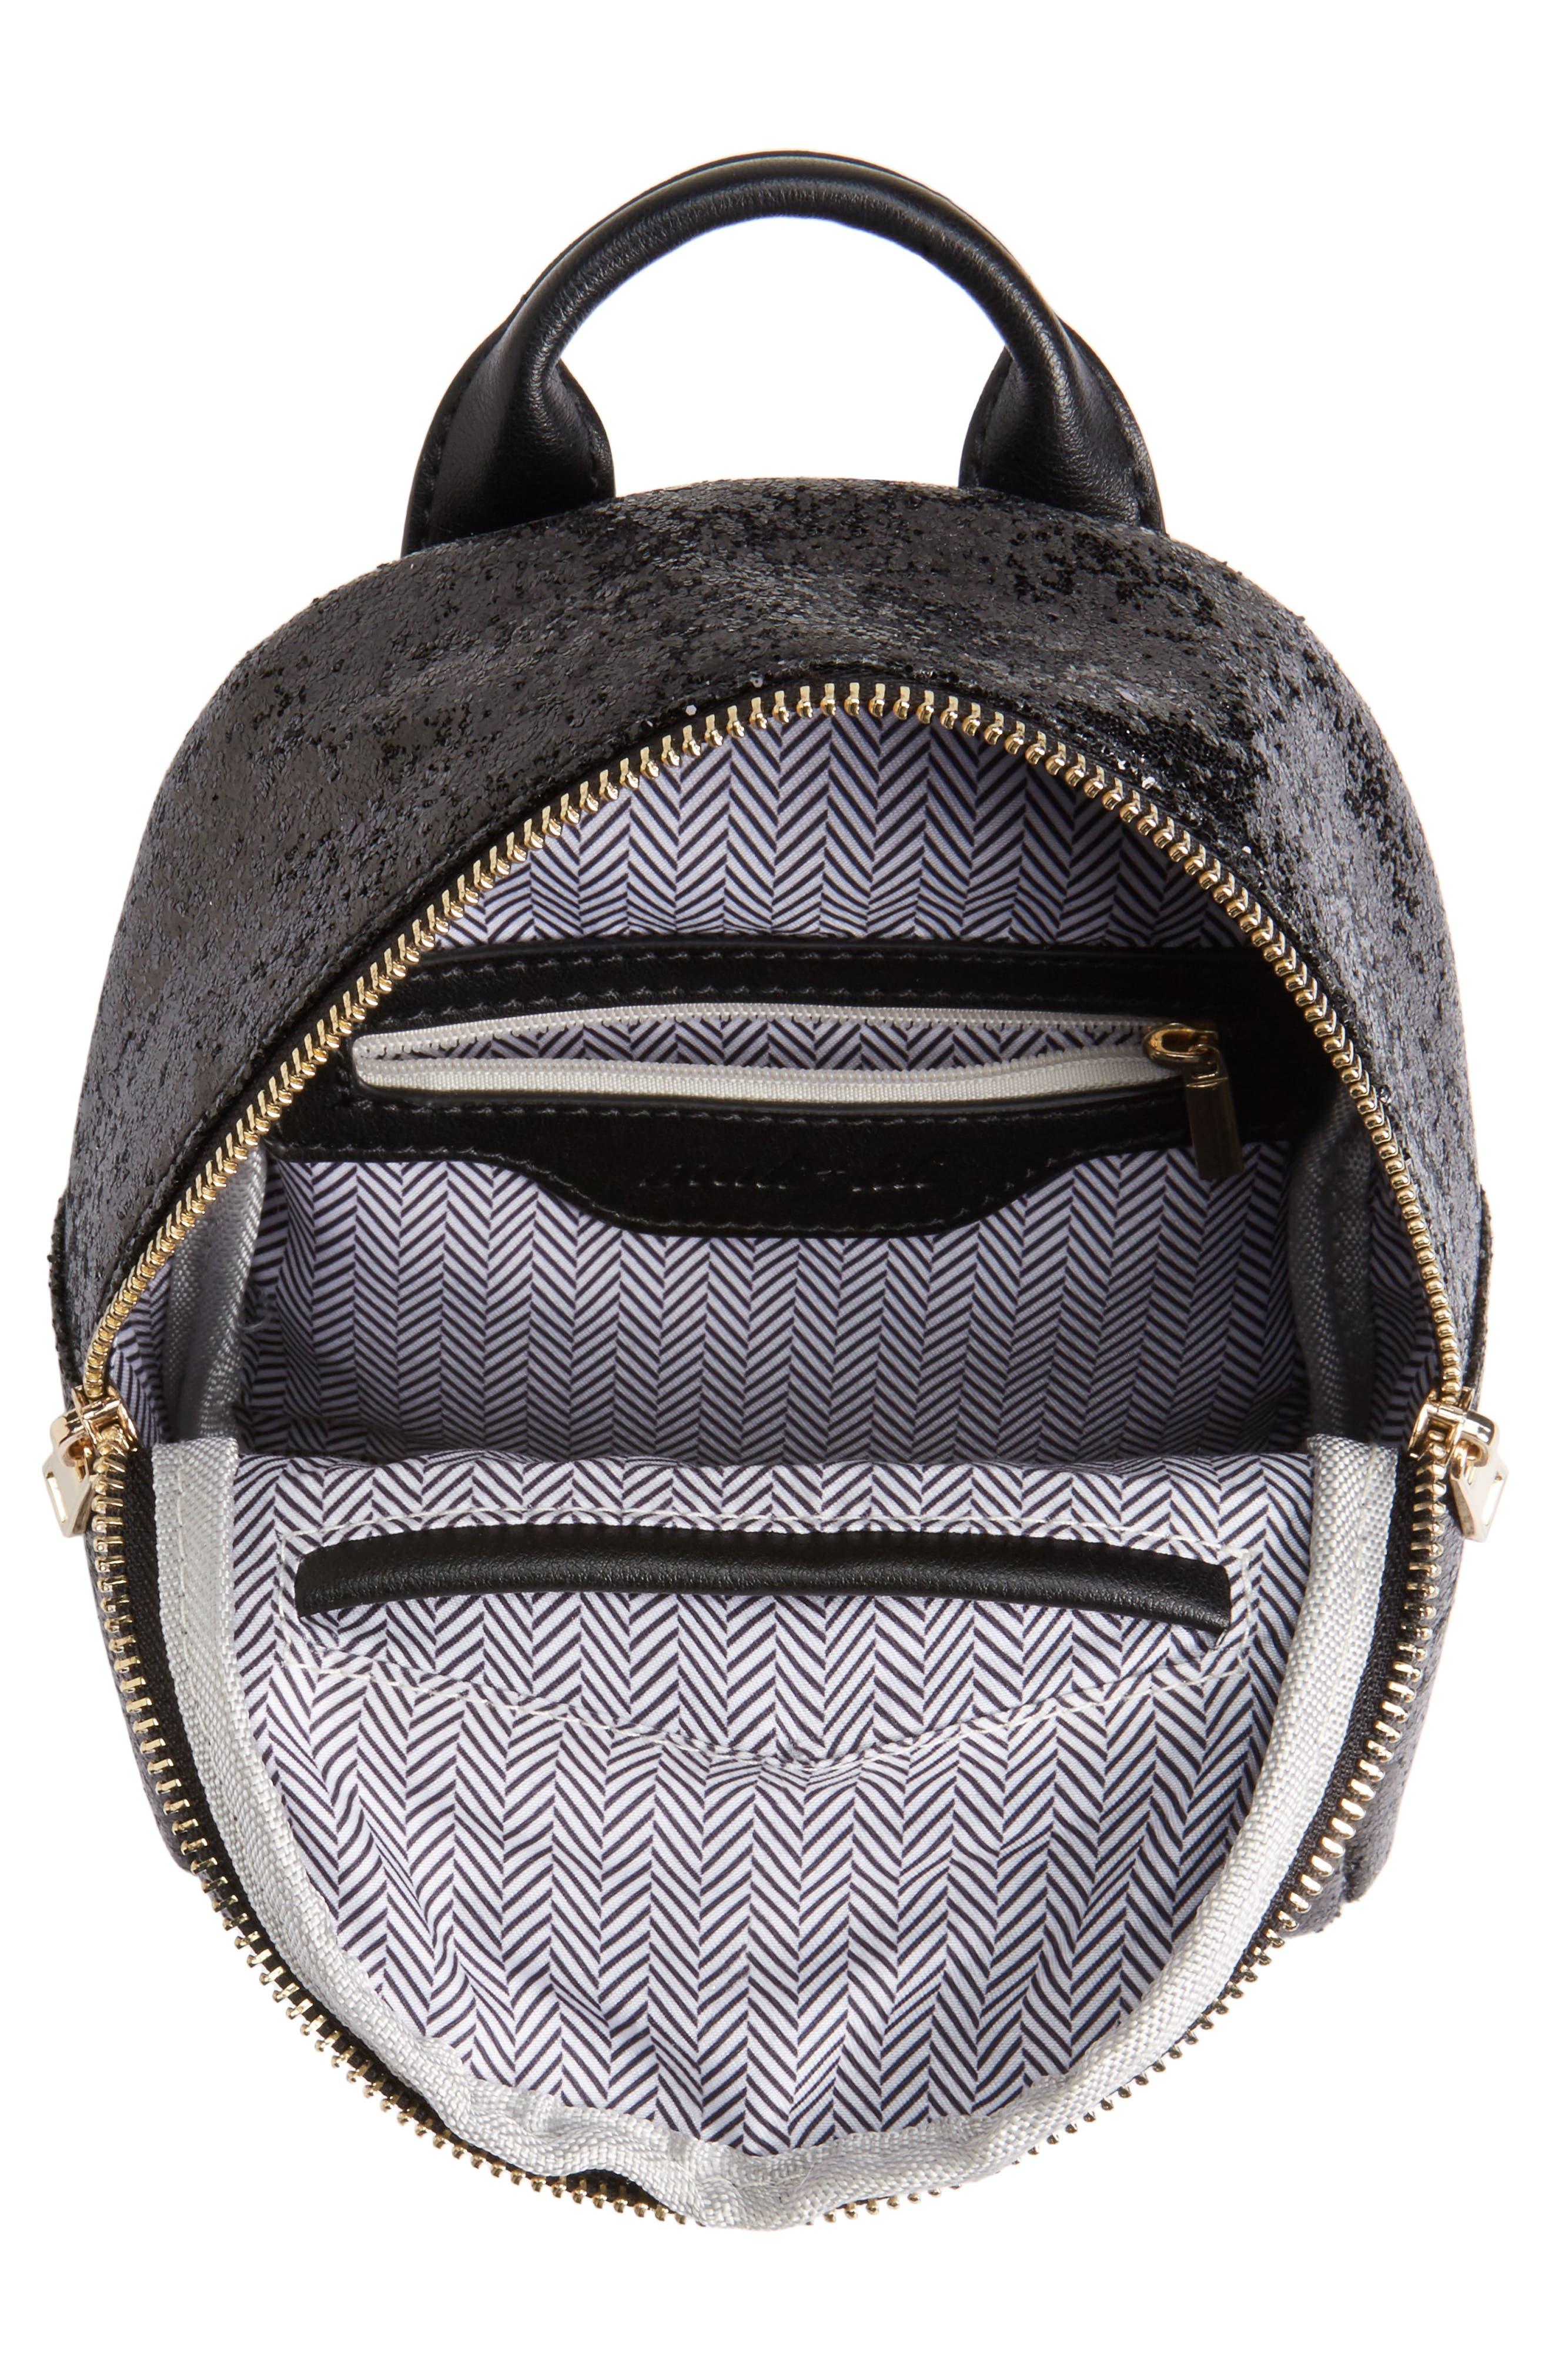 Mali + Lili Glitter Vegan Leather Backpack,                             Alternate thumbnail 4, color,                             BLACK